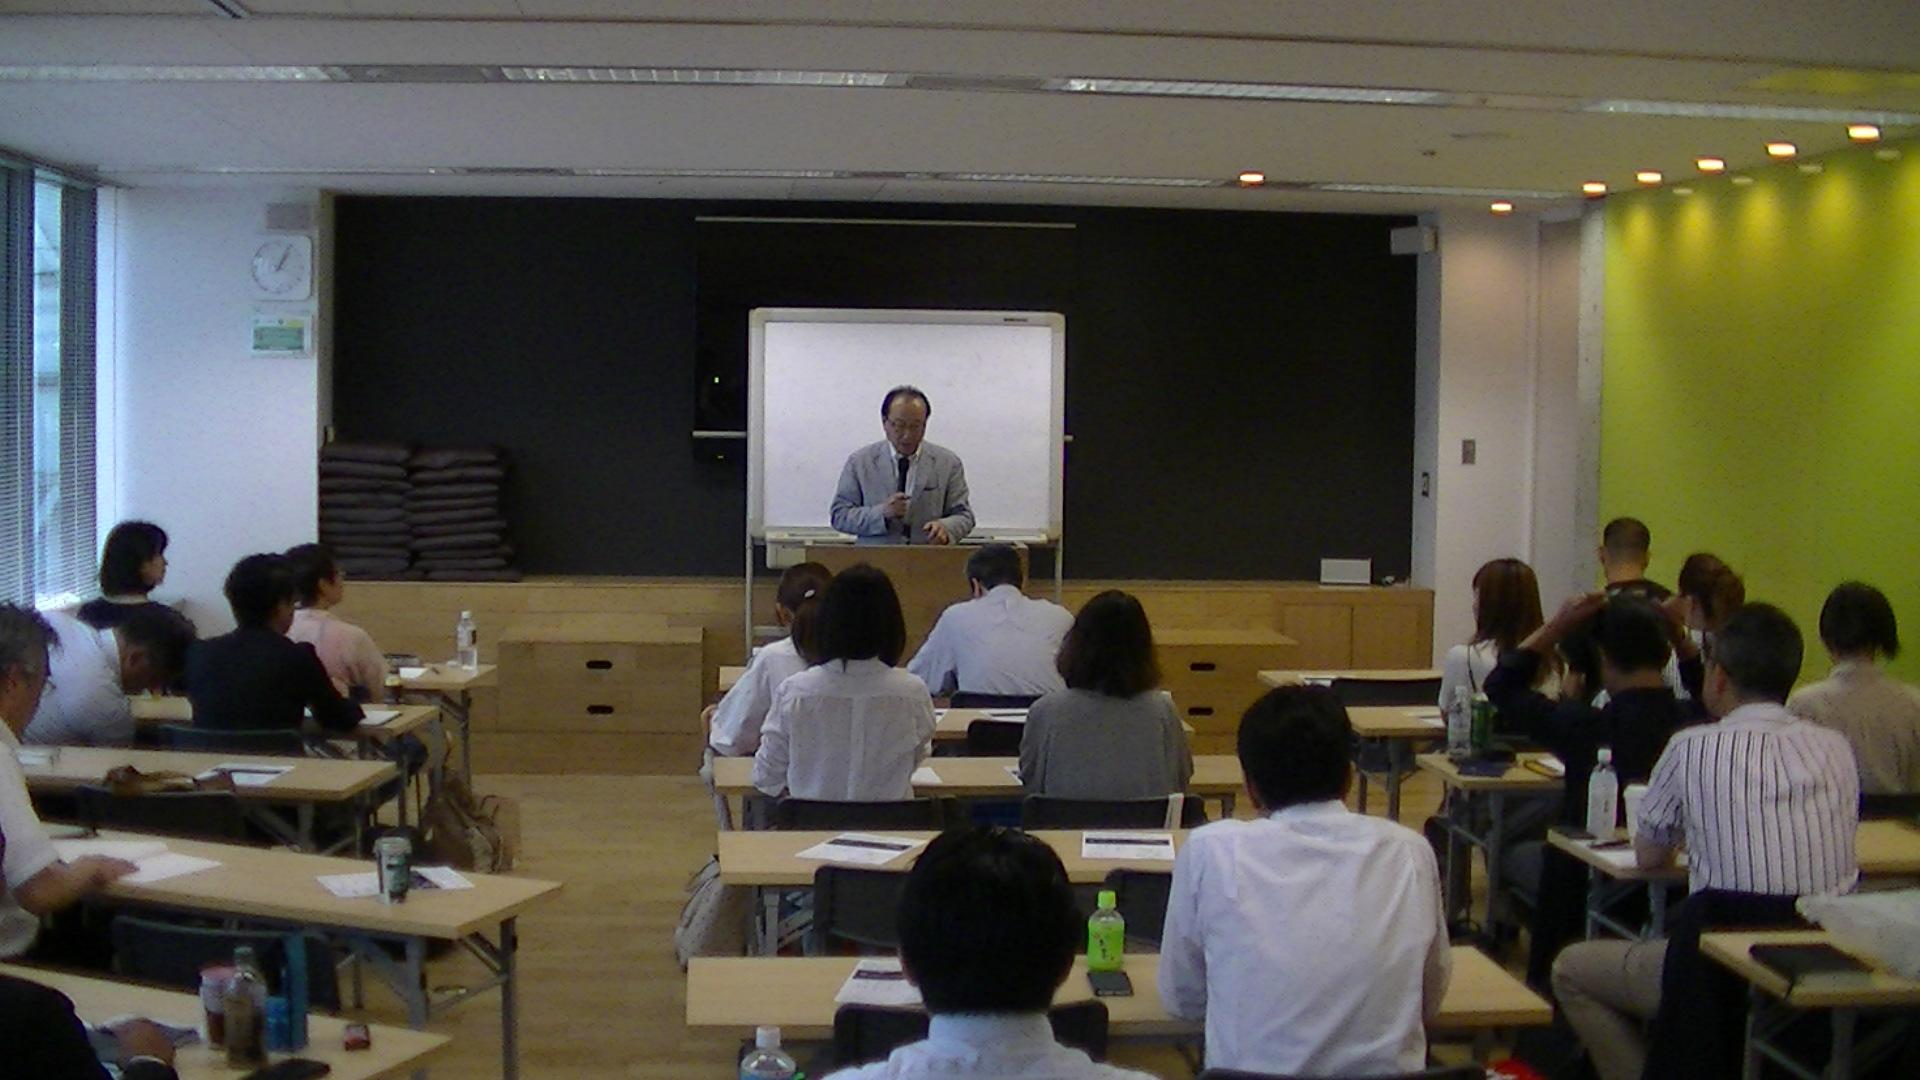 PIC 1072 - 思風会全国大会in広島